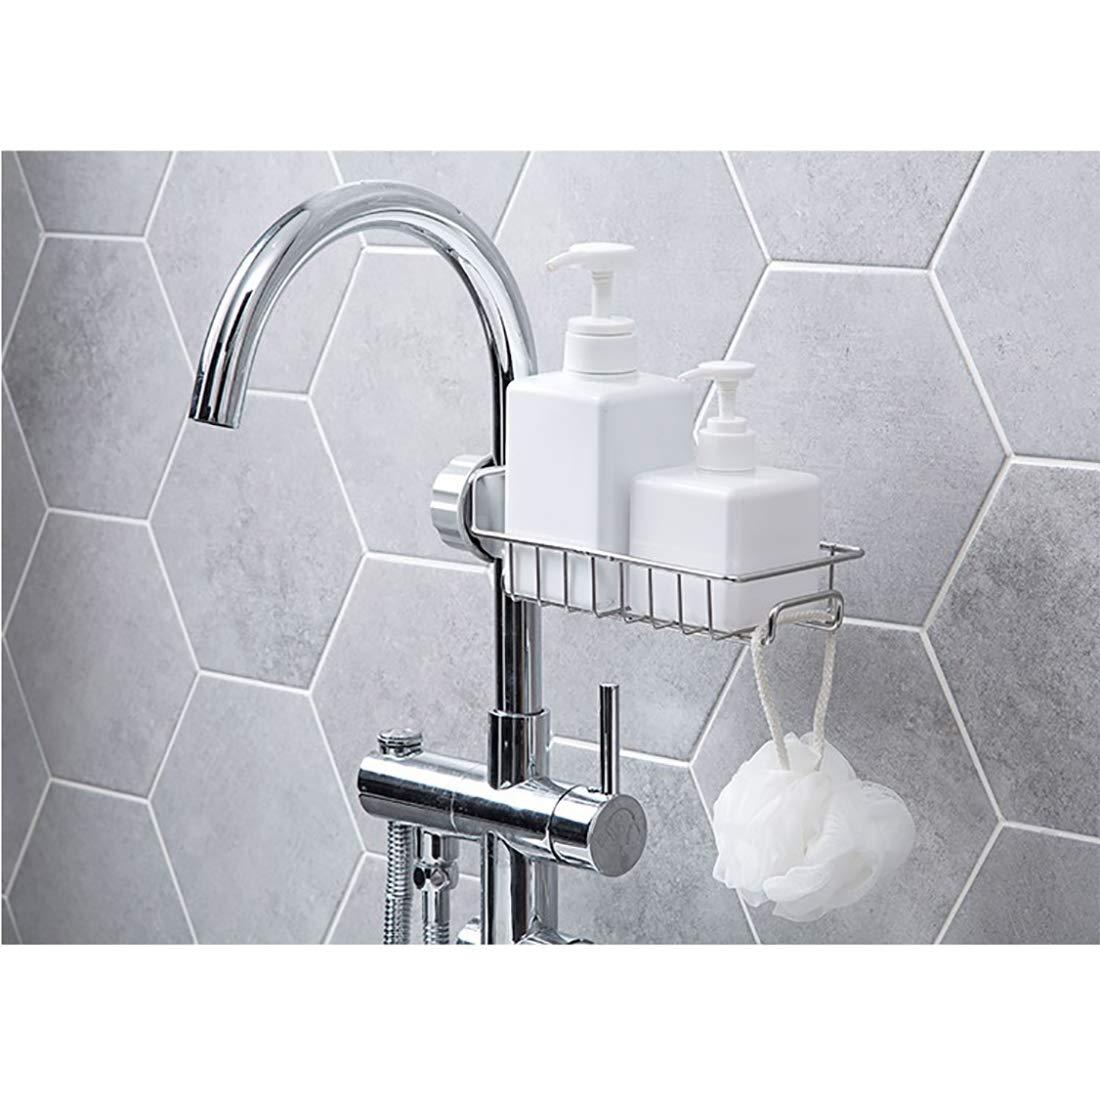 Stainless Steel Faucet Sink Storage Basket Kitchen Sink Shelf Sponge Holder